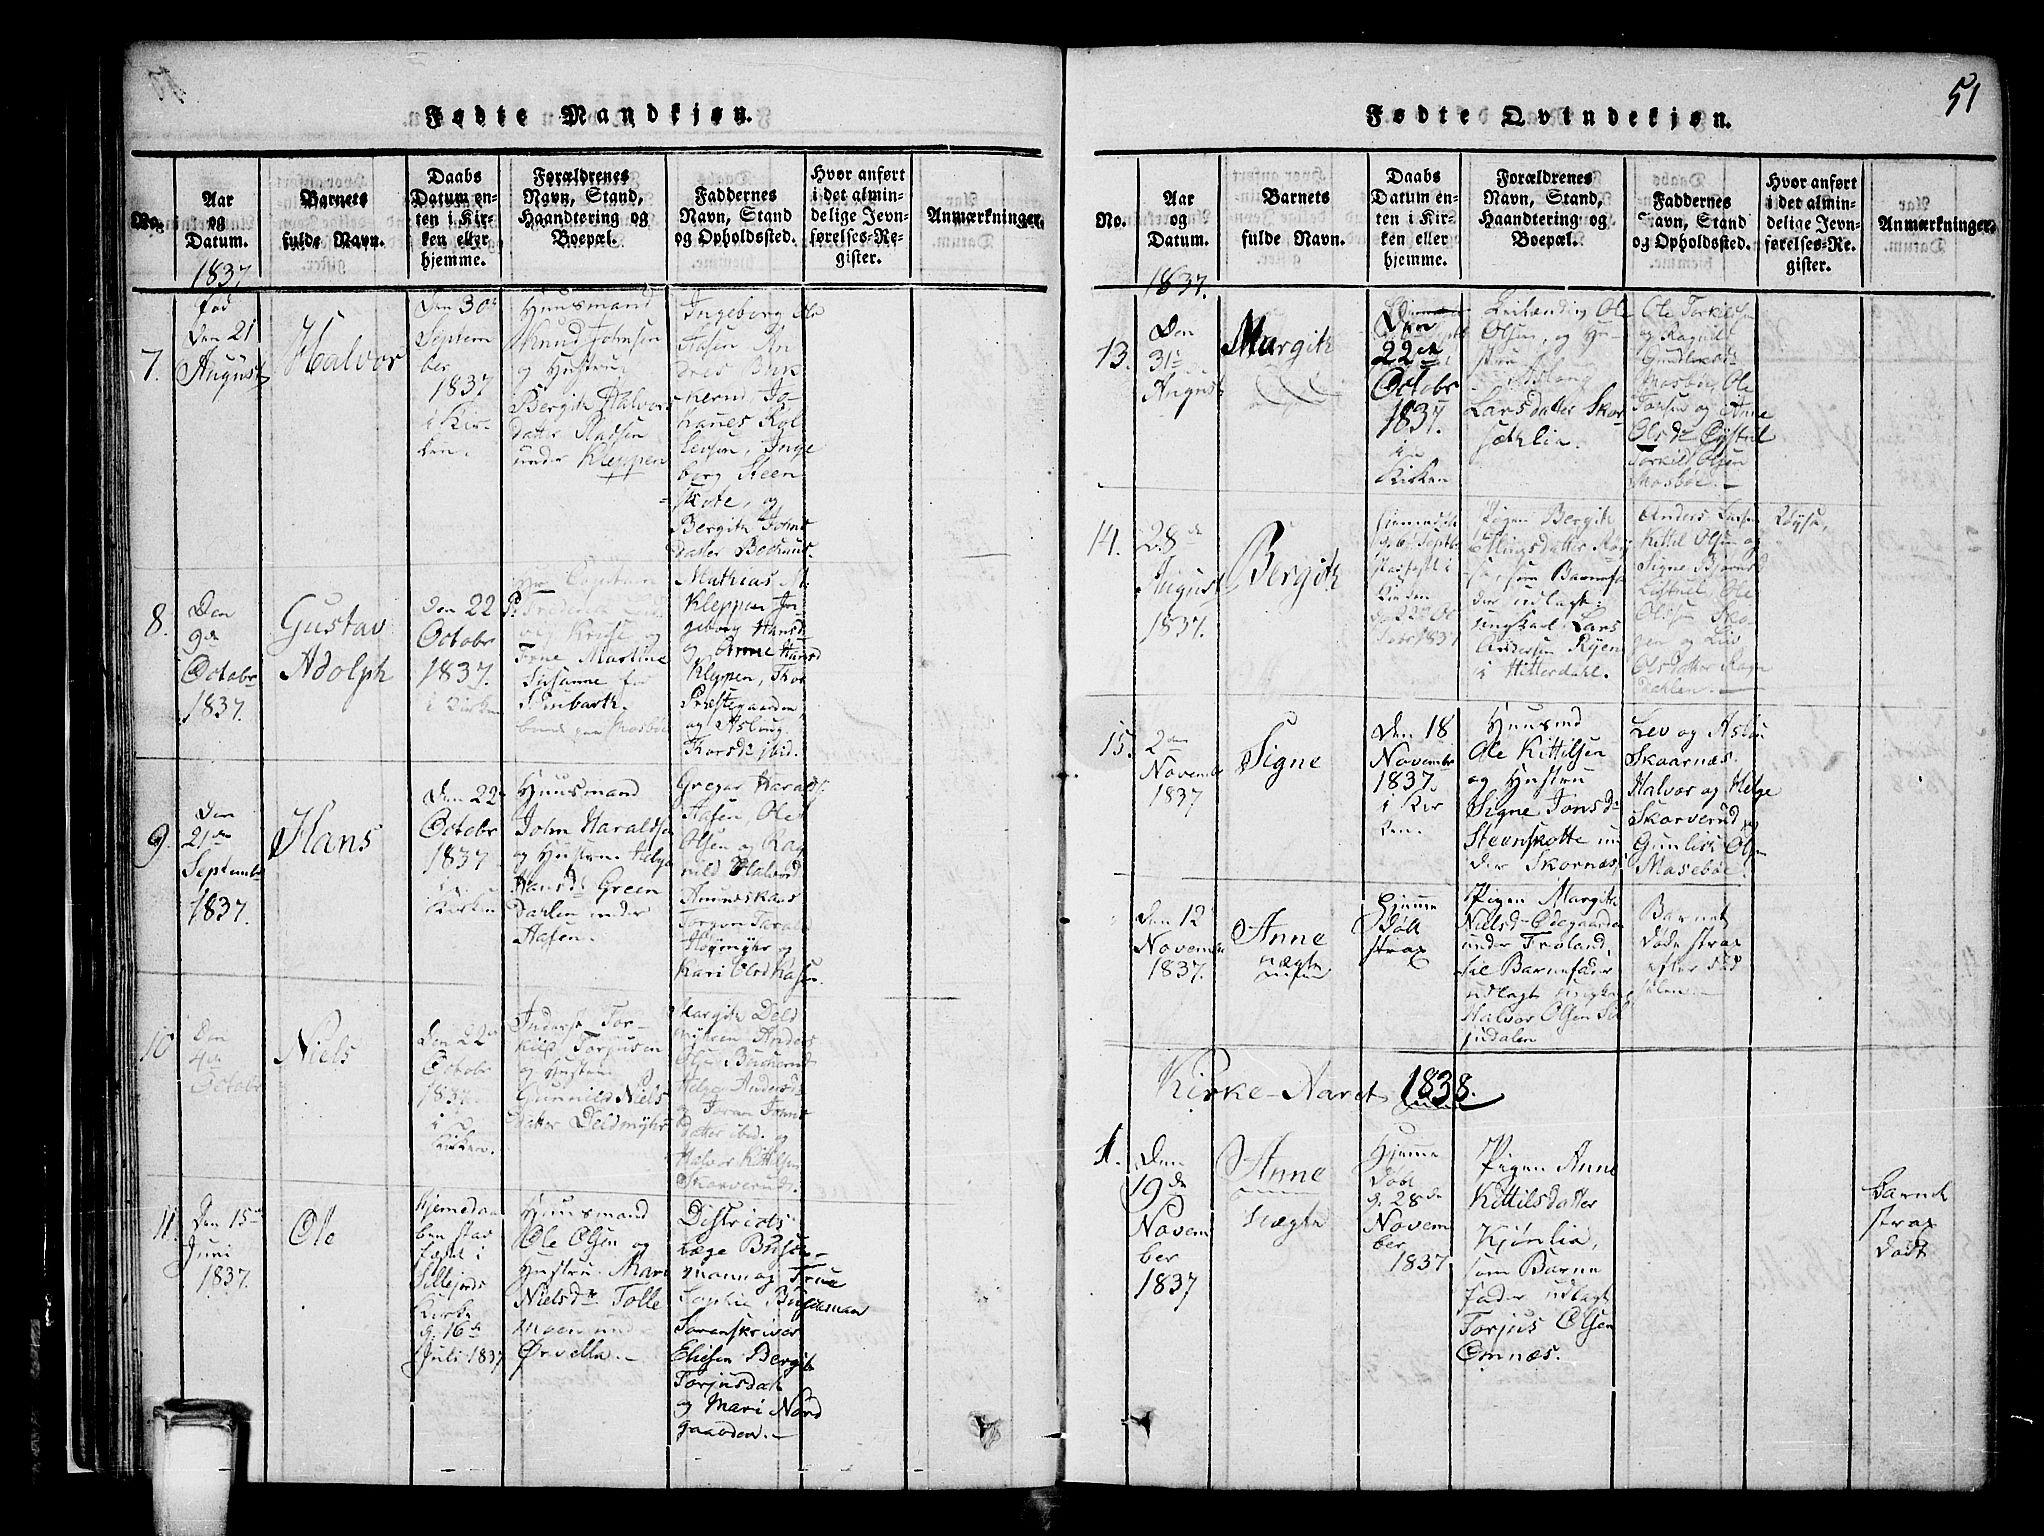 SAKO, Hjartdal kirkebøker, G/Gb/L0001: Klokkerbok nr. II 1, 1815-1842, s. 51